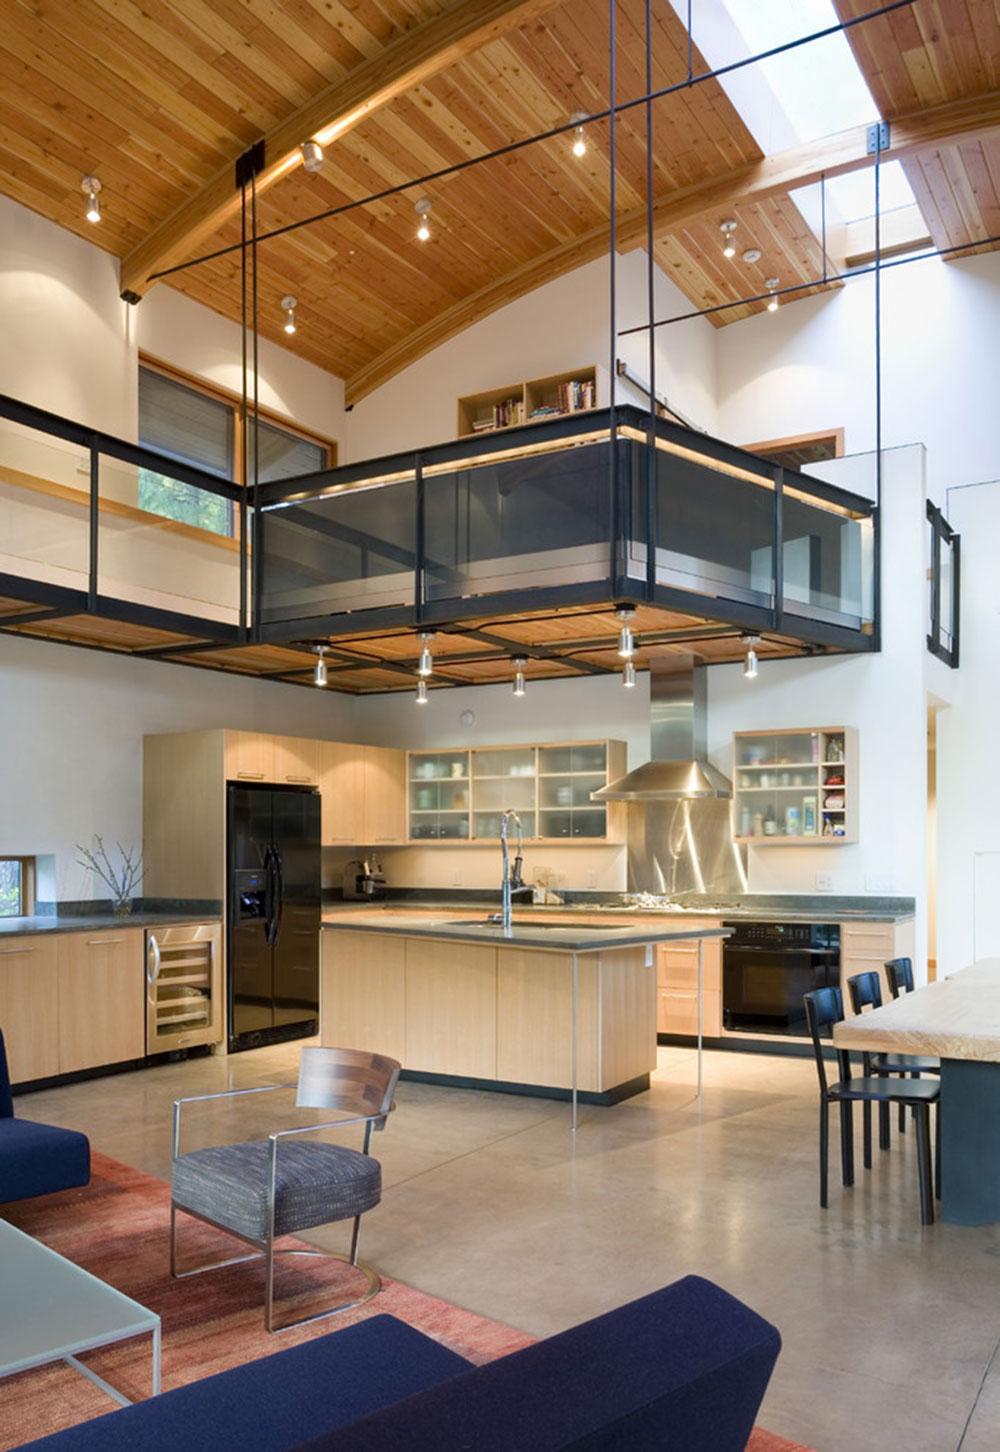 Useful tips for designing a loft